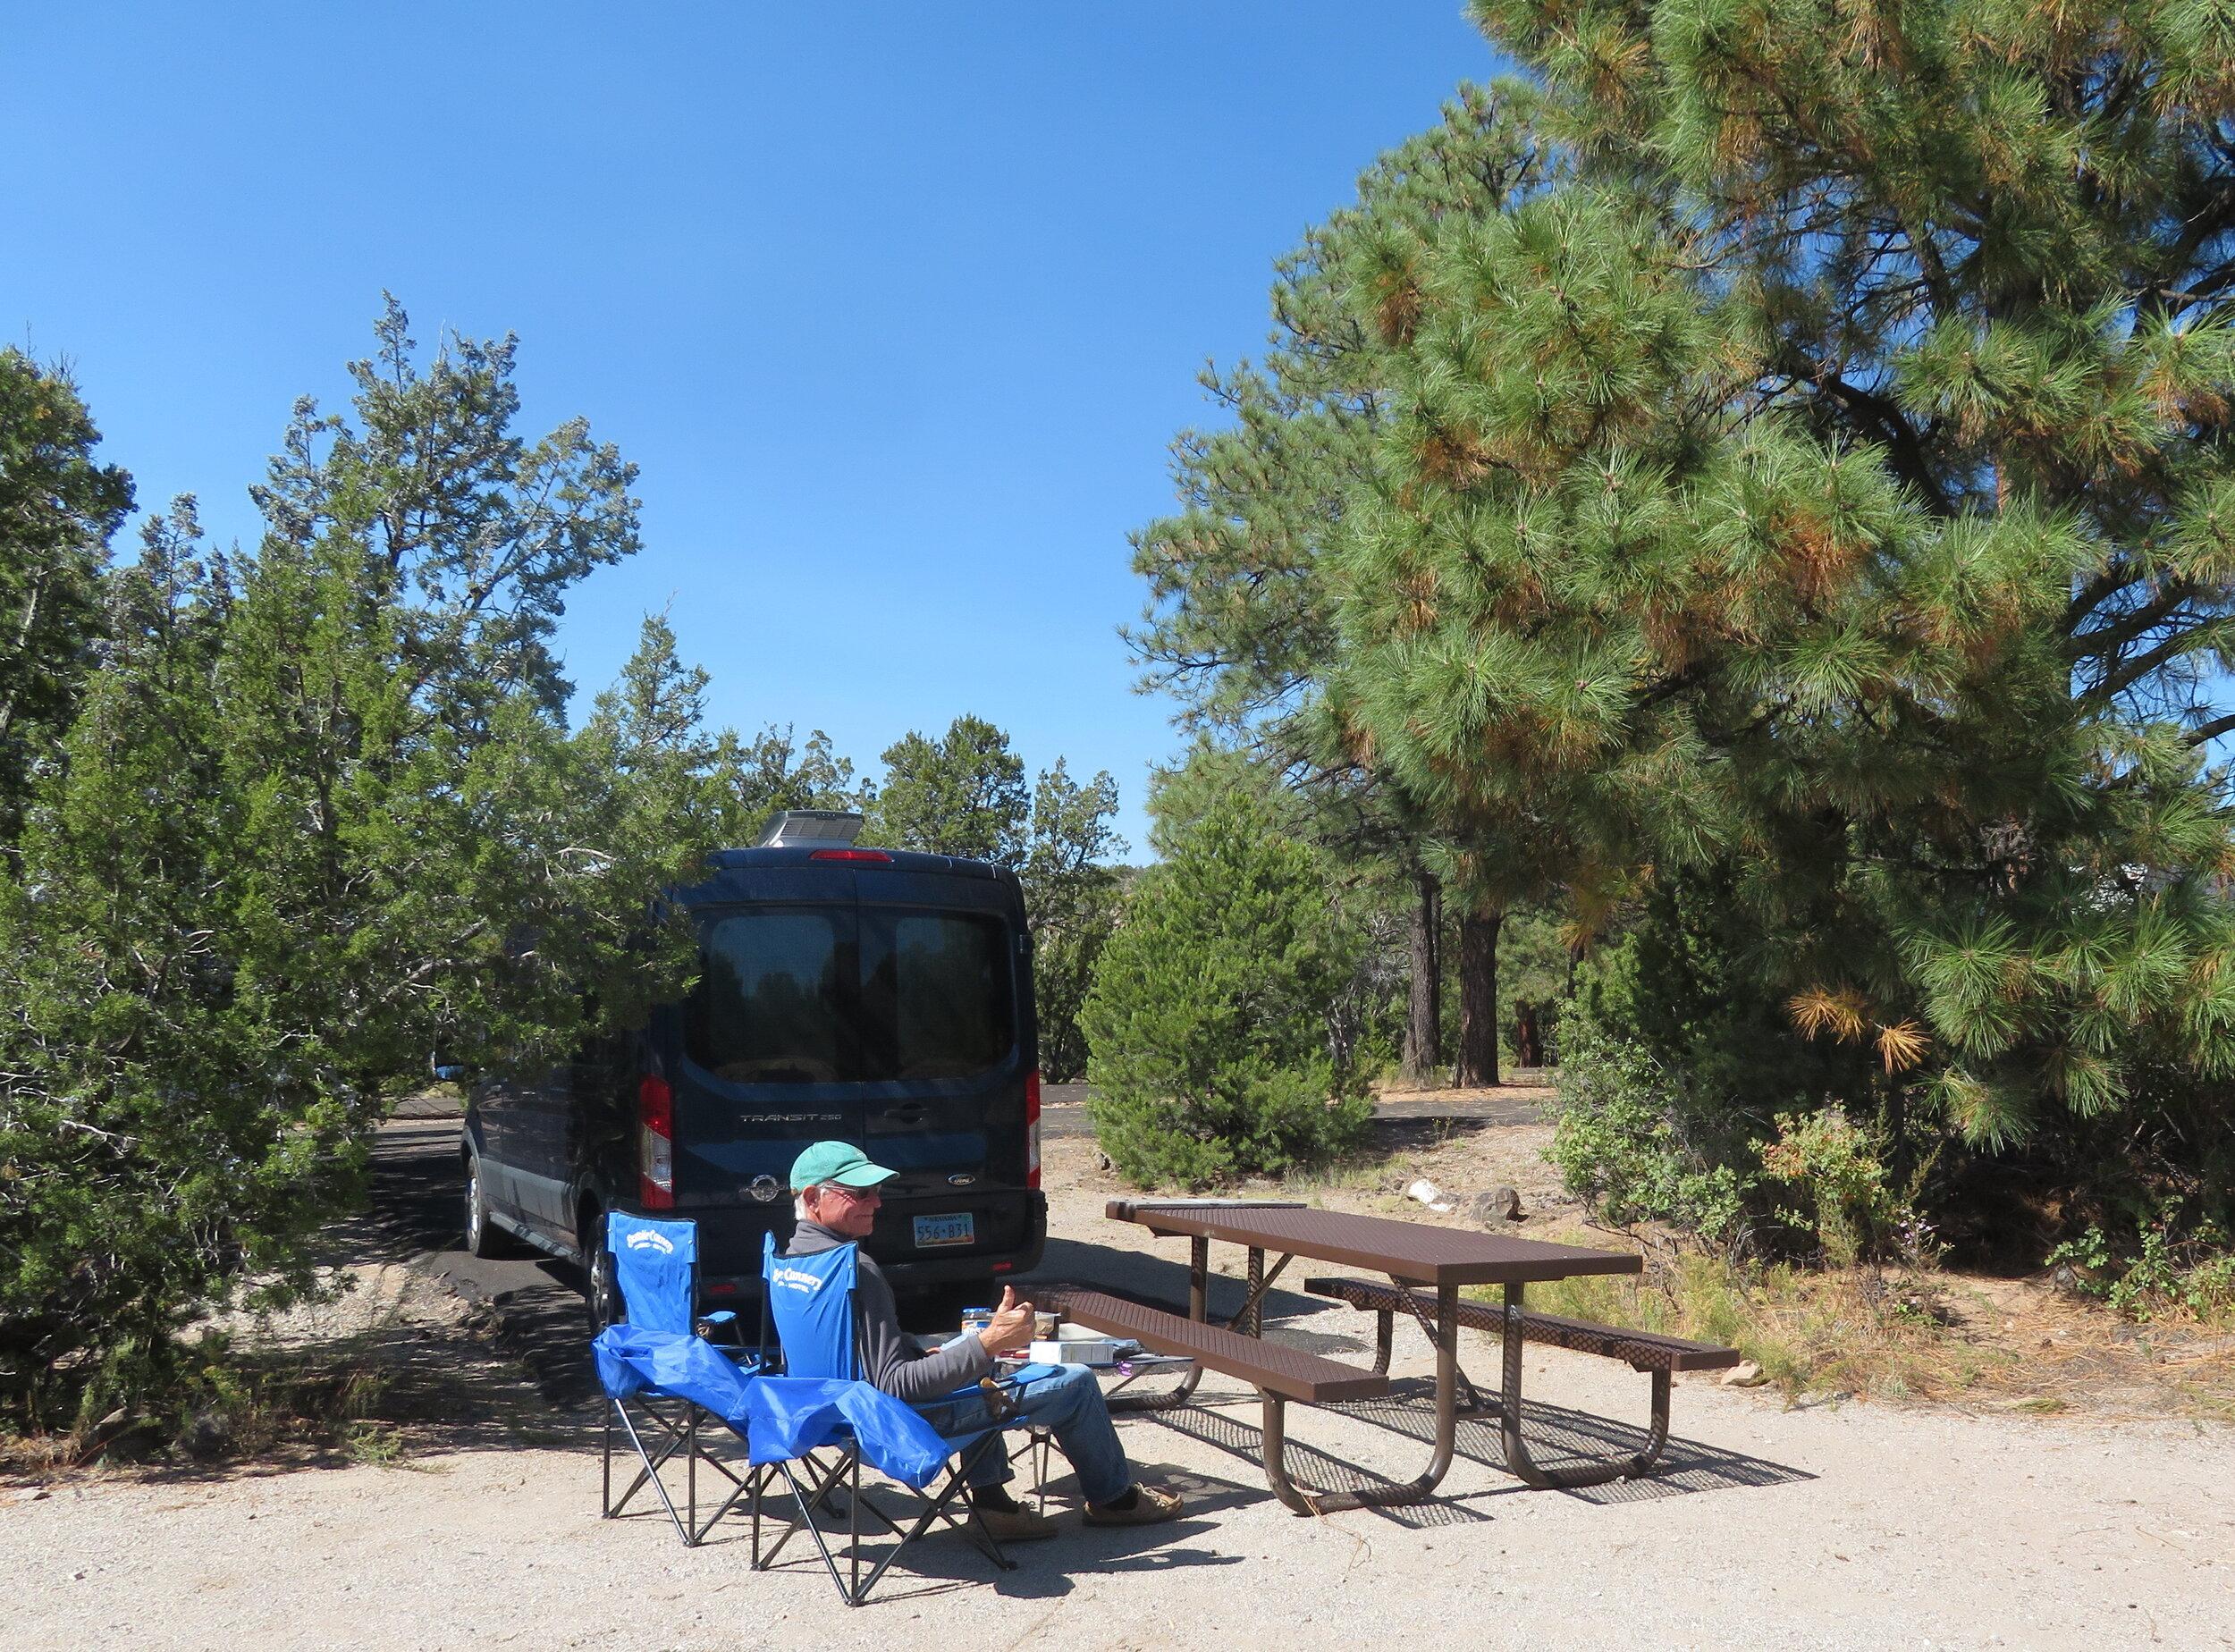 Junper Campground, Abert's Squirrel Loop #11